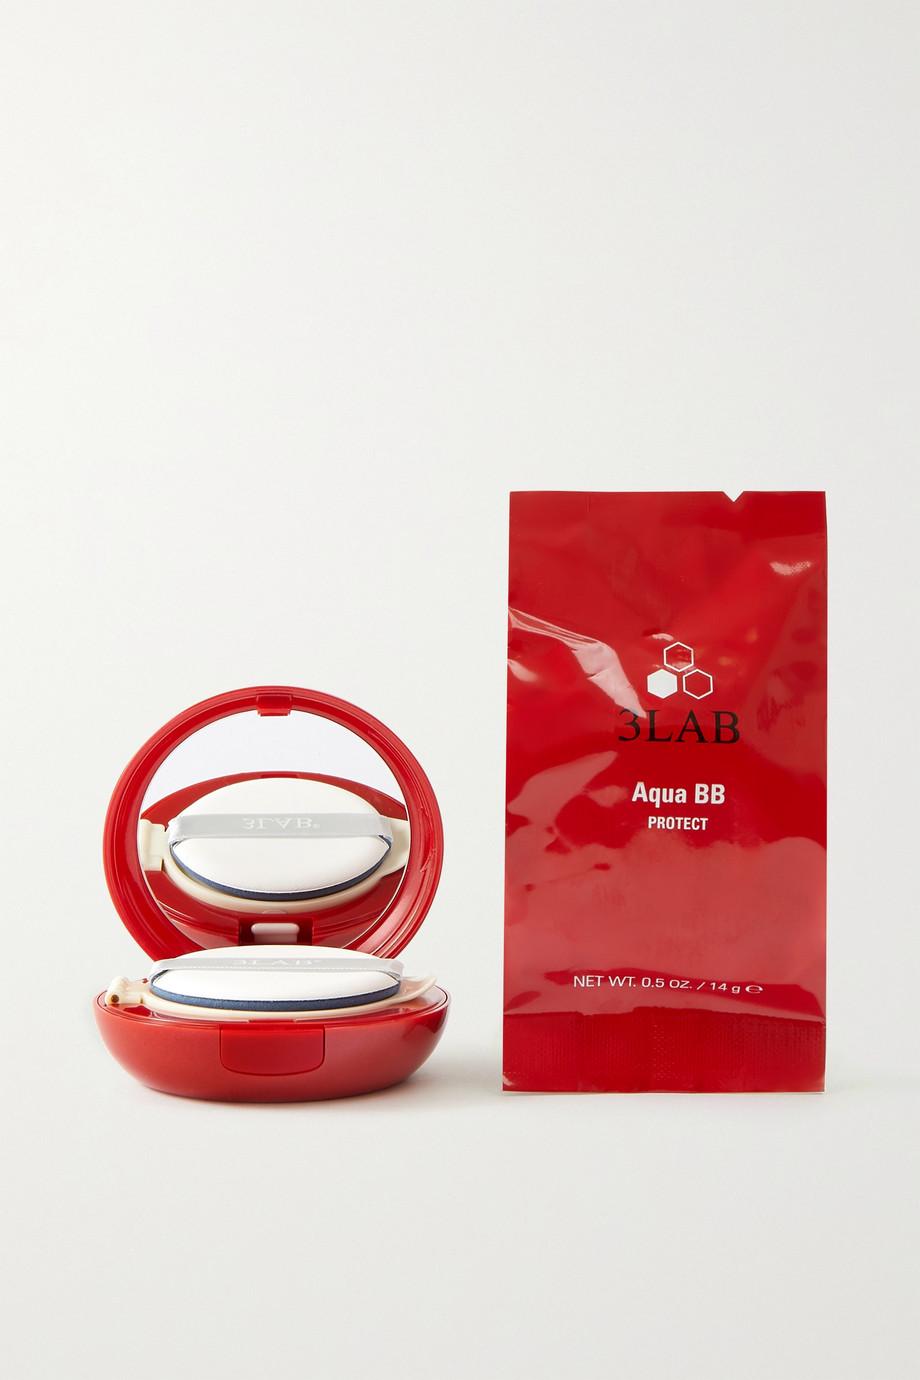 3LAB Aqua BB Protect – 02 Medium, 2 x 14 g – BB Cream